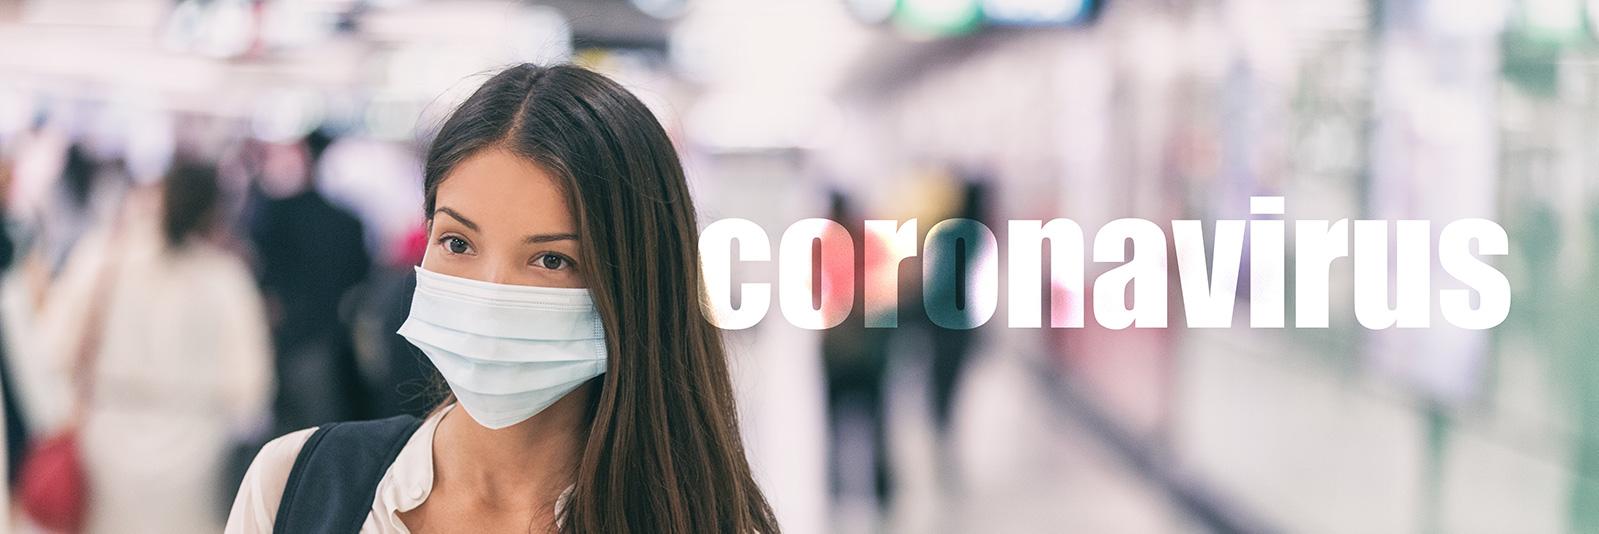 Corona virus Homes schooling Canada